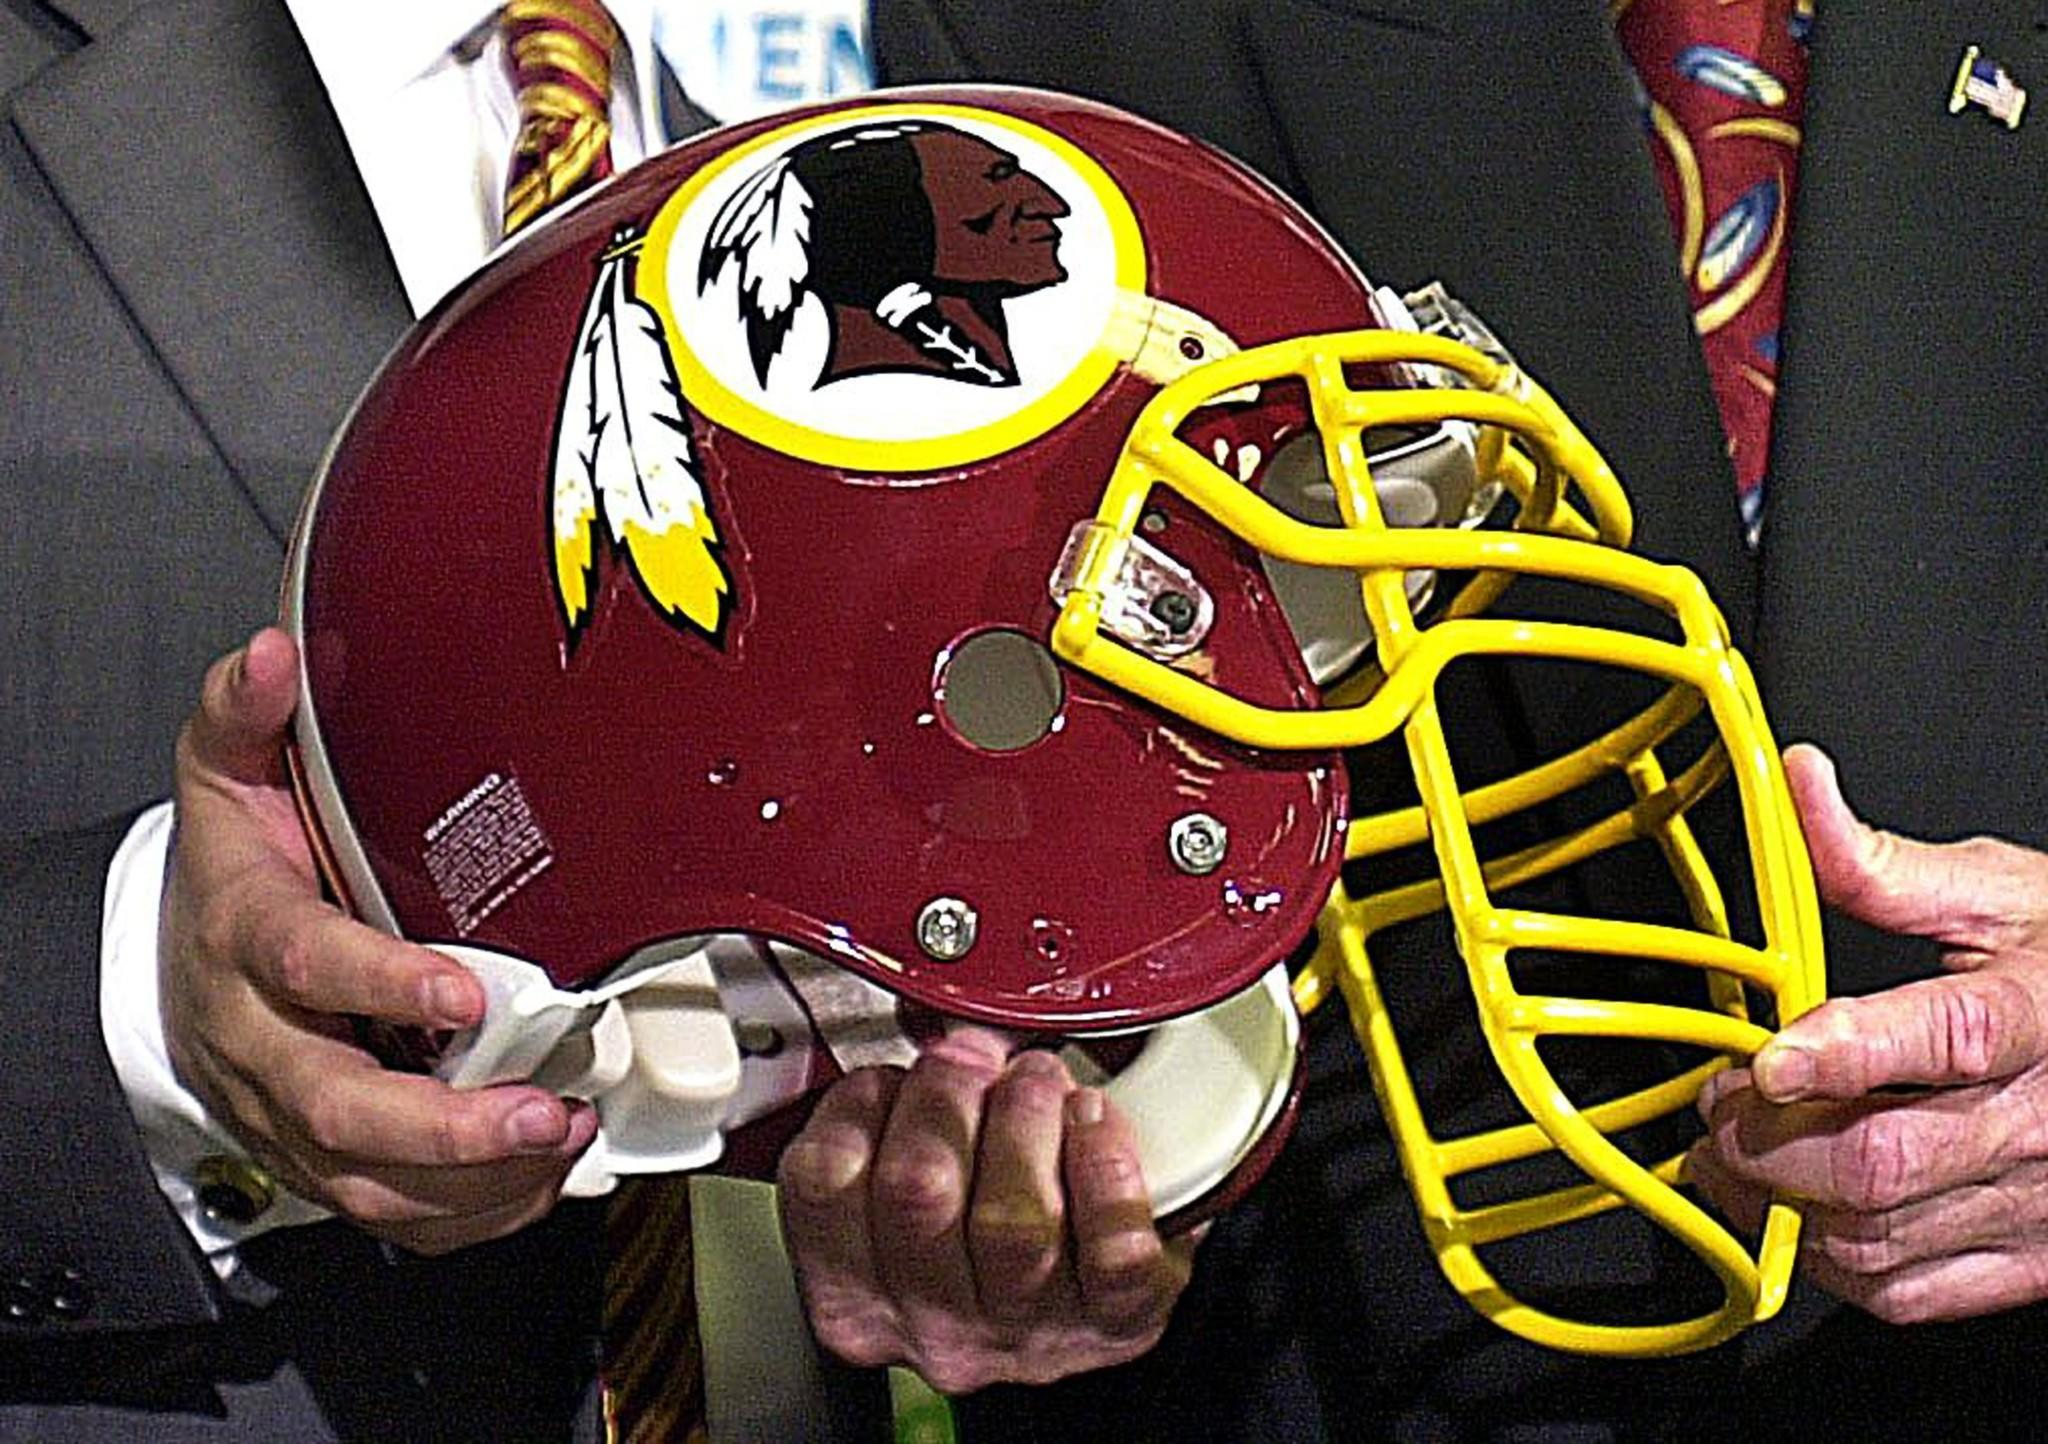 The Washington Redskins helmet.